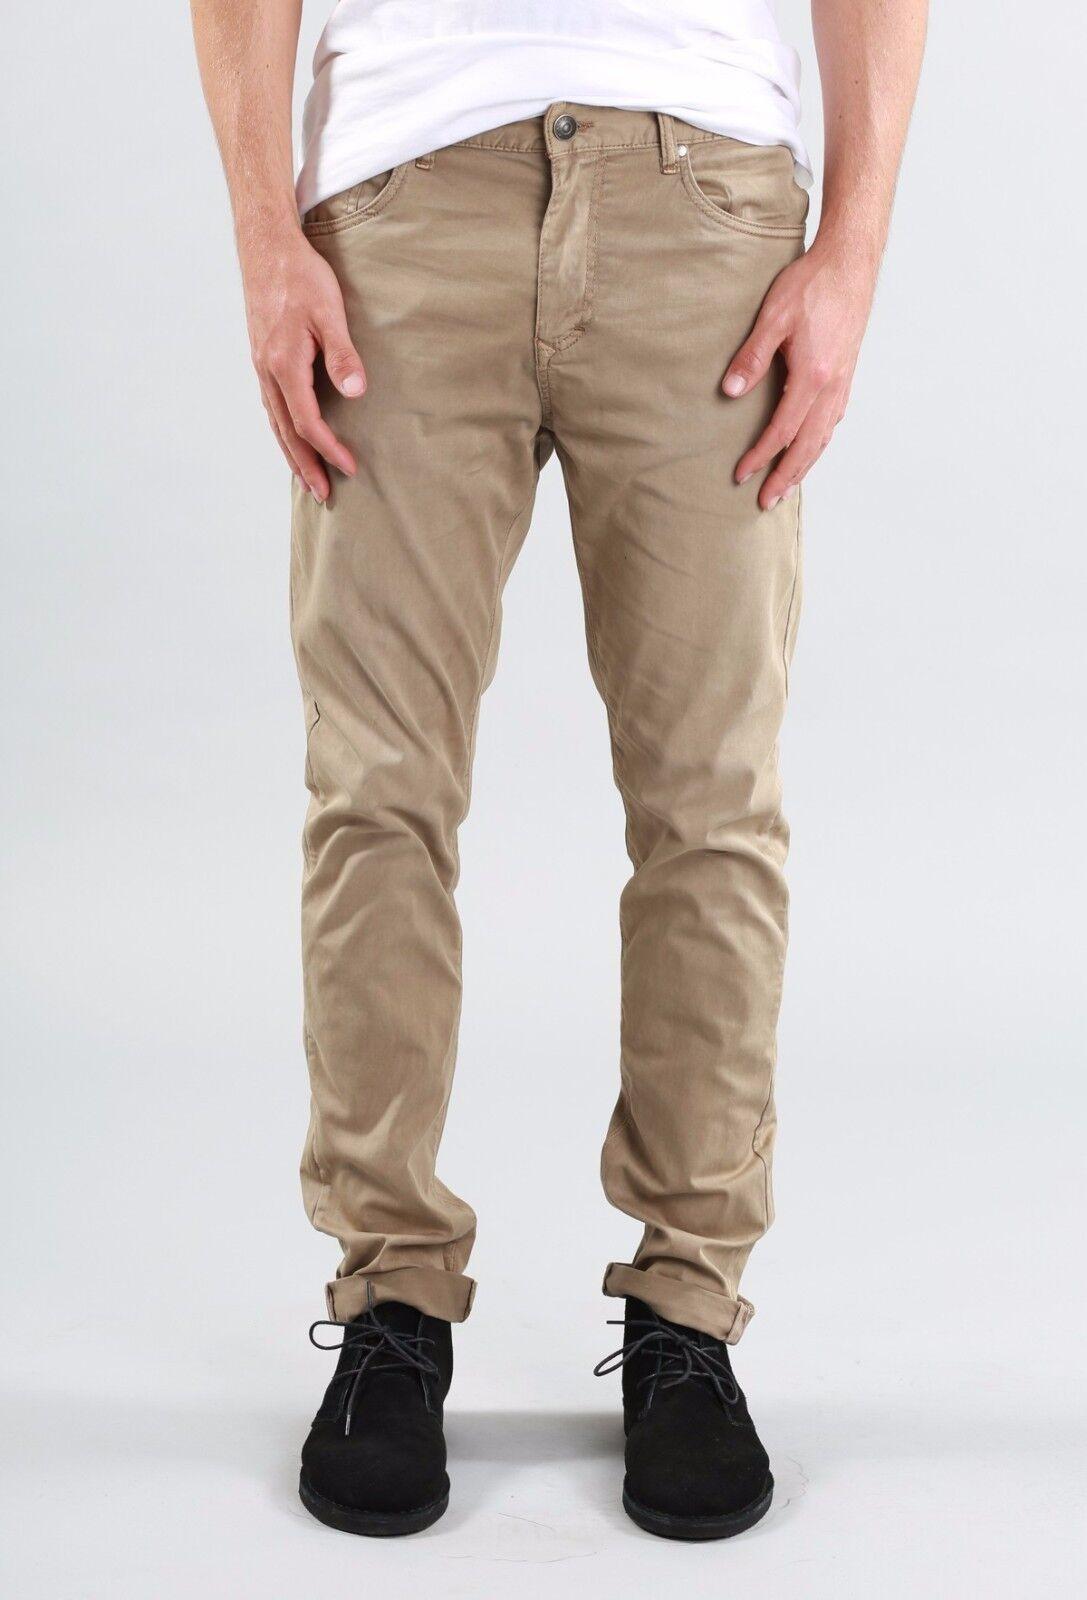 Rusty Indi Slims Men Slouch Rise Narrow leg Illusion Pants Fennel Khaki Size W30